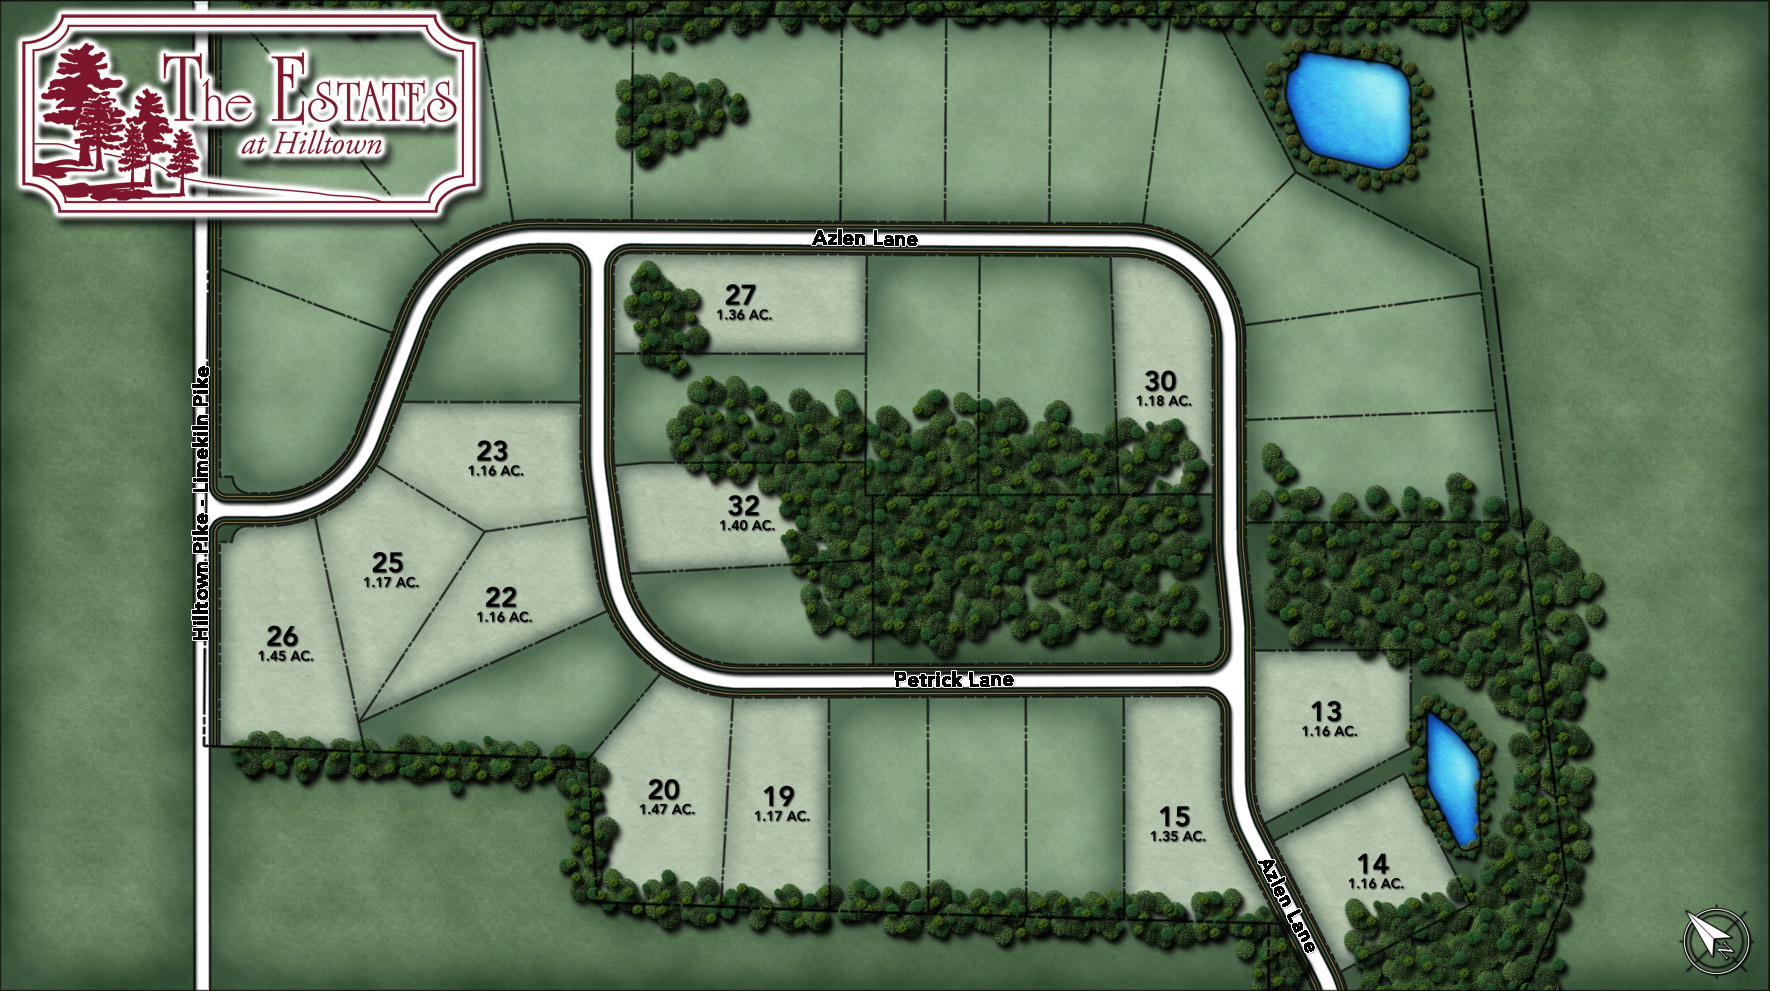 Estates at Hilltown Site Plan